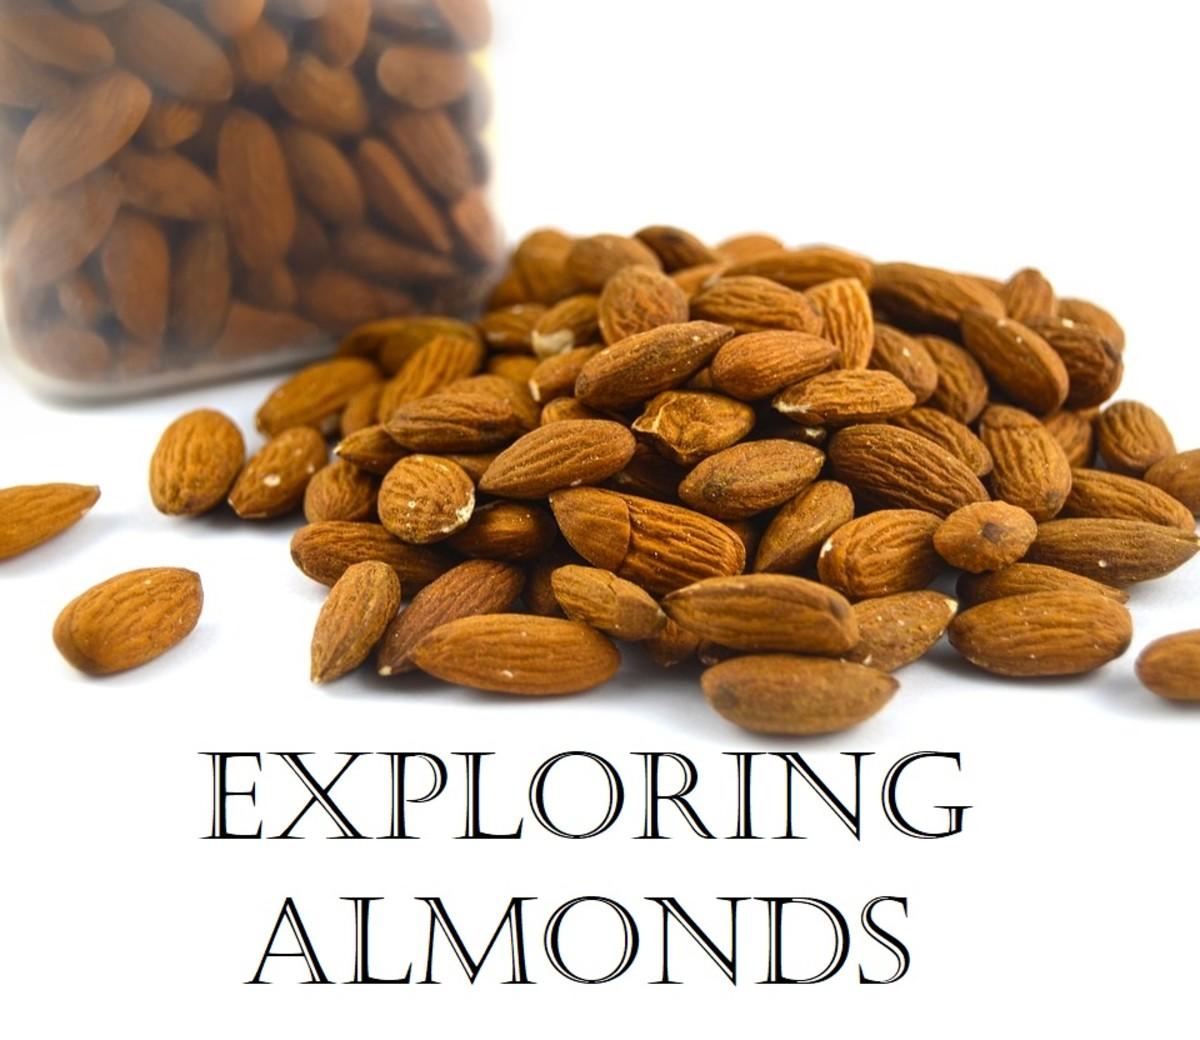 Exploring Almonds: History and 8 Imaginative Recipes